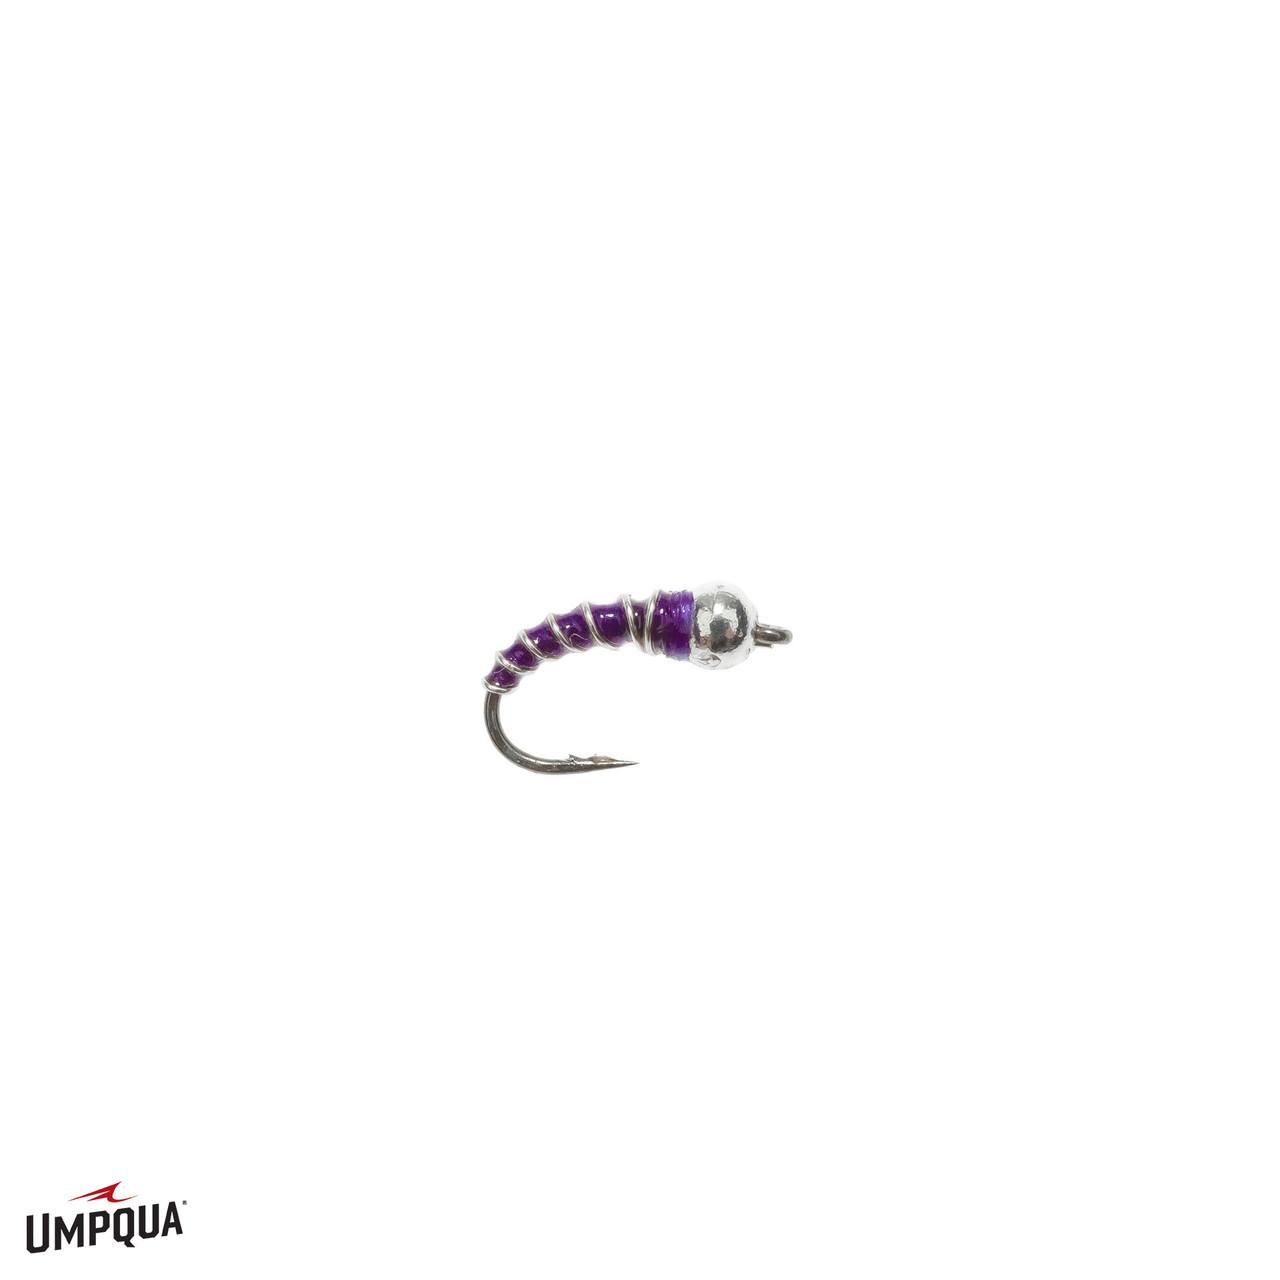 Chaud Motif Tungstène Zebra Midge Emerger FLY Violet Avec Nickel Bead Sz 12